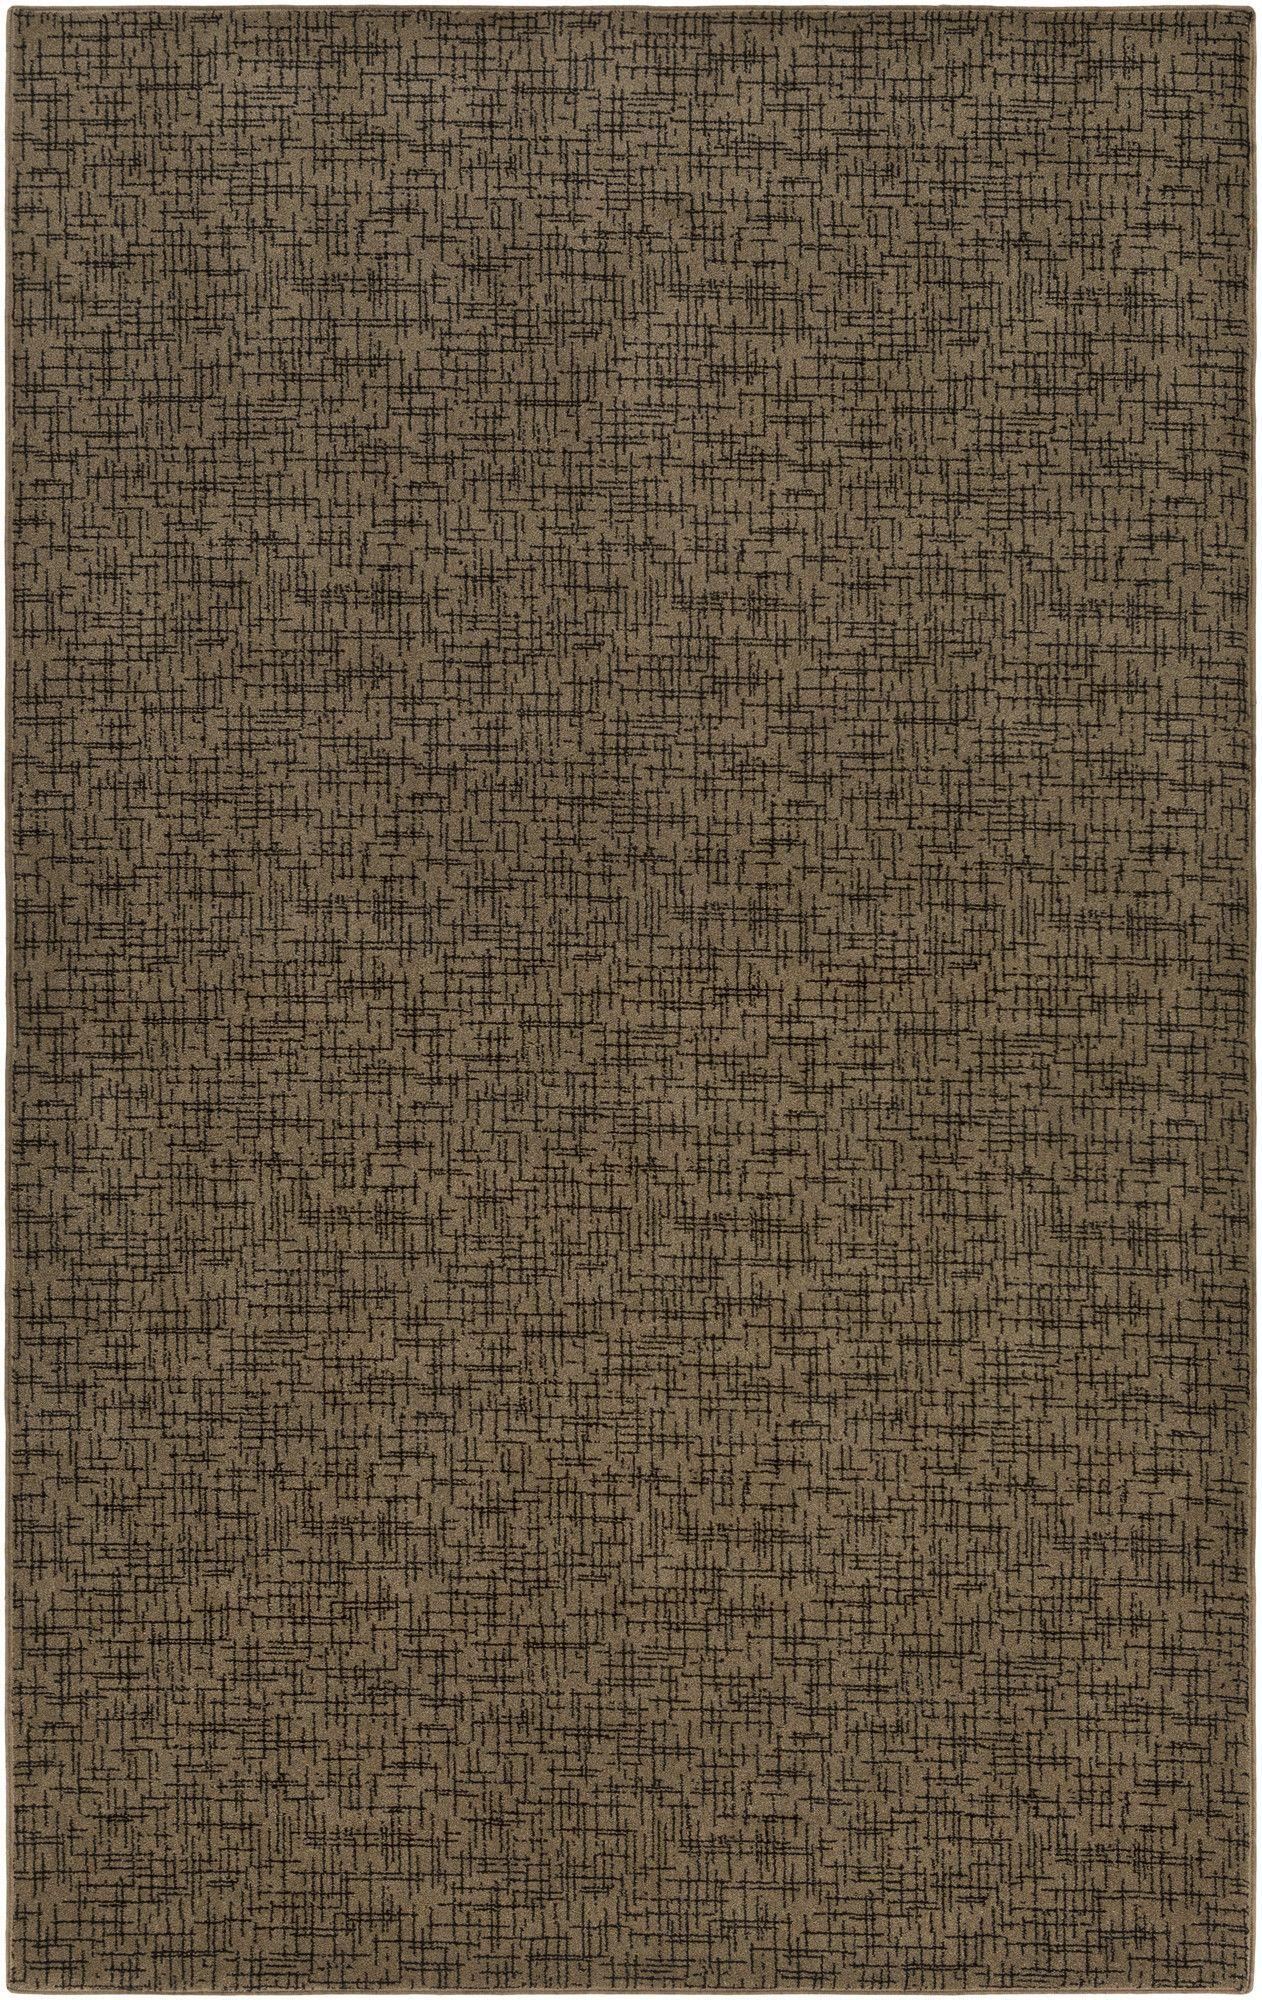 Attalus Brown Indoor/Outdoor Area Rug